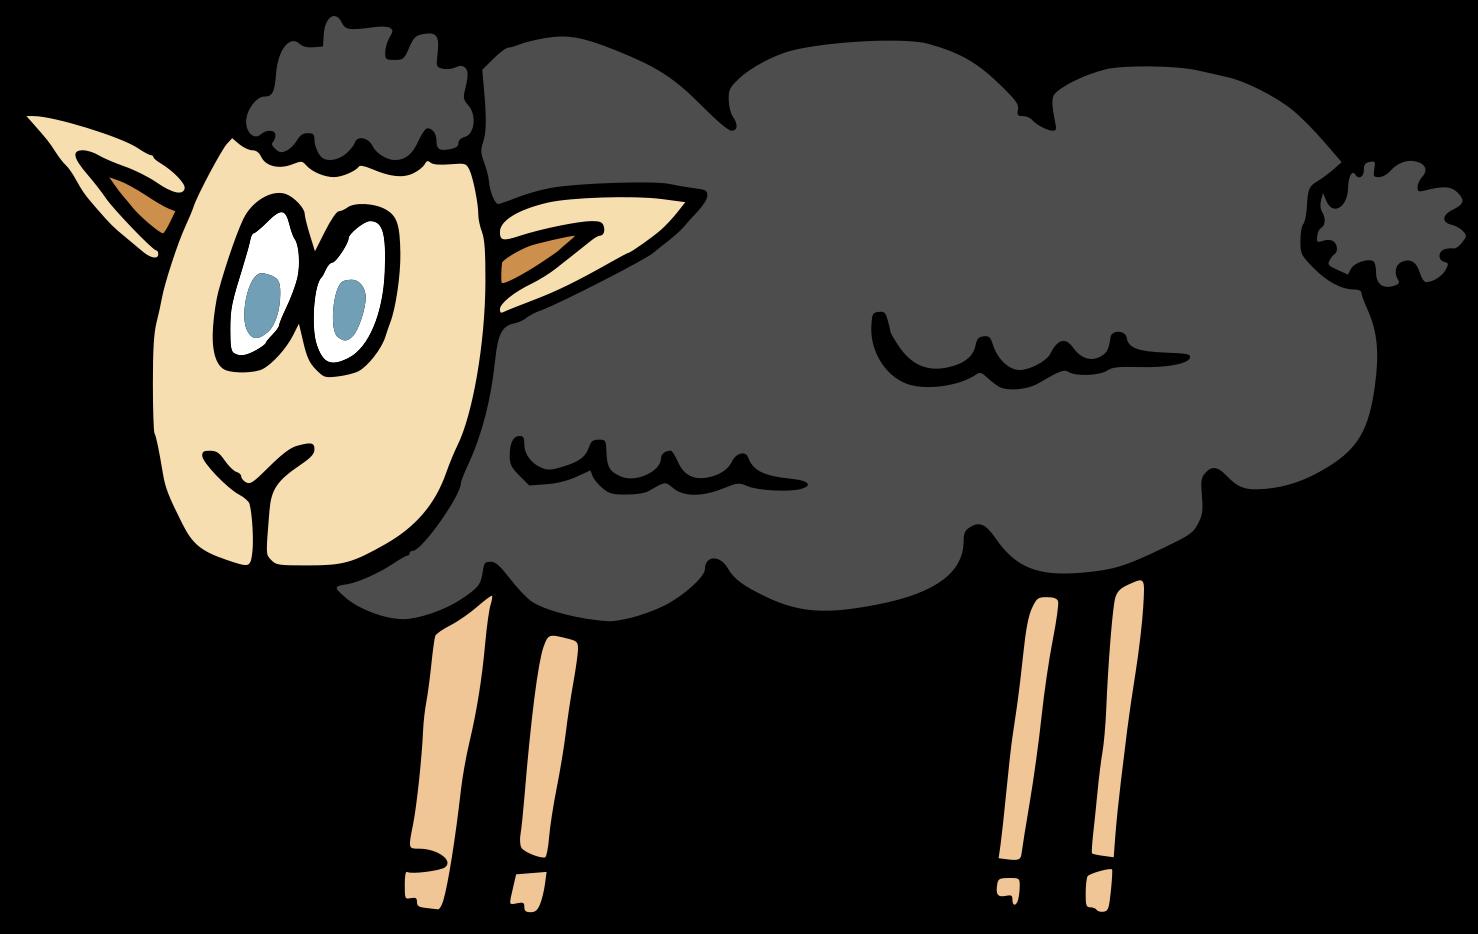 cartoon-sheep-1.png